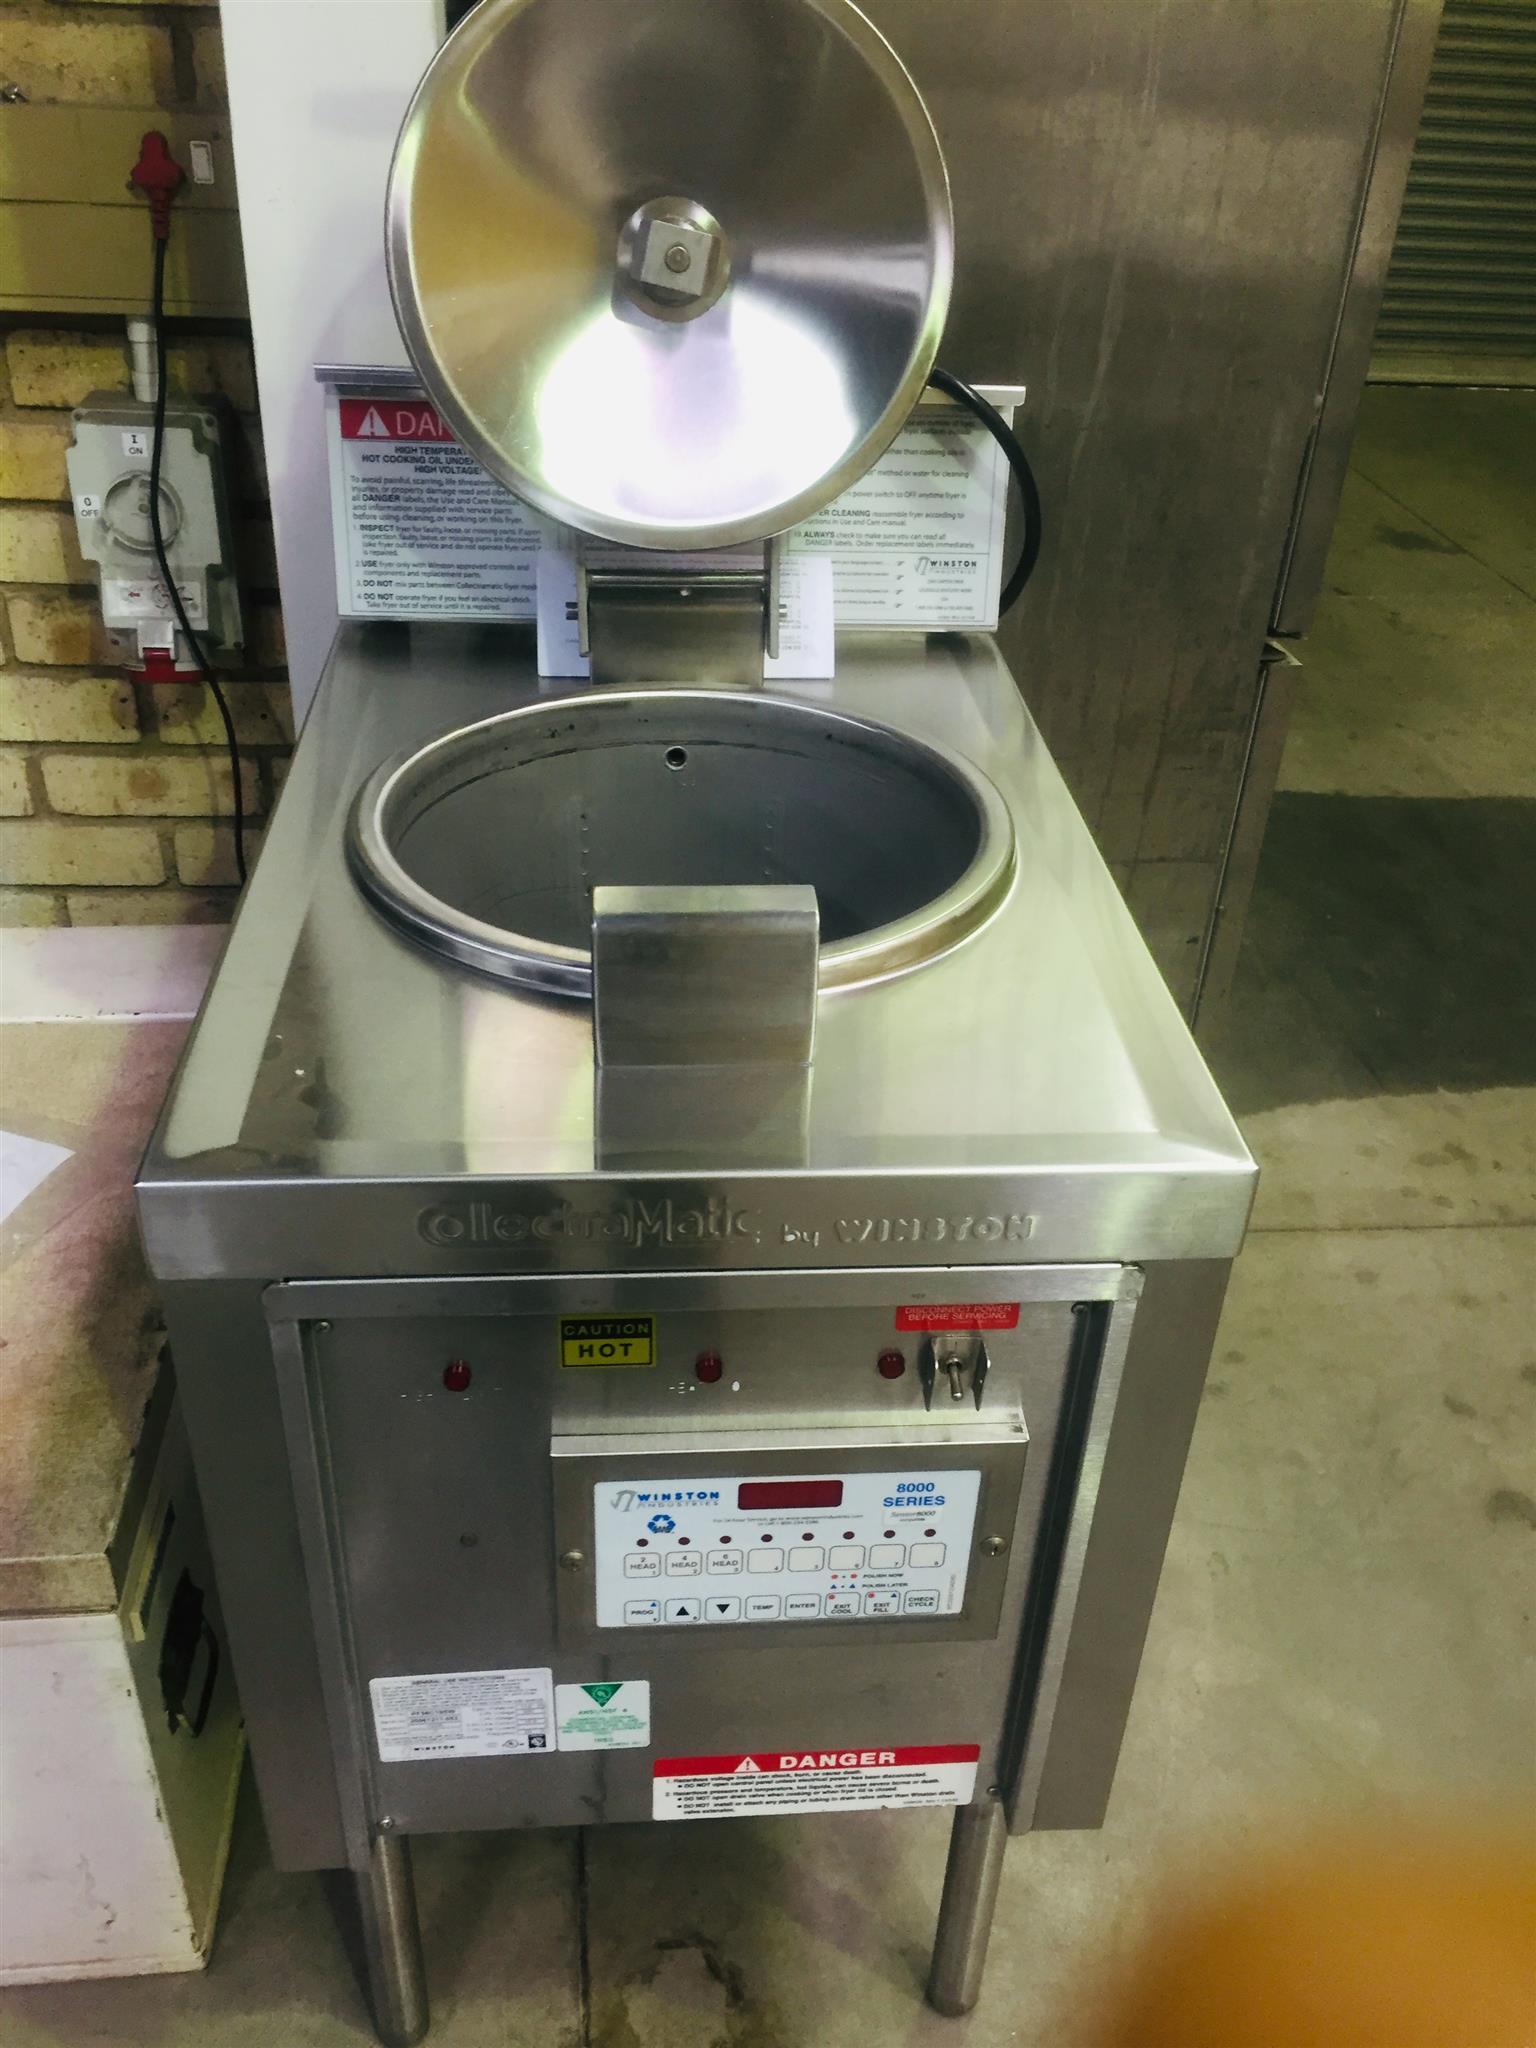 Winston PF56C Pressure Fryer